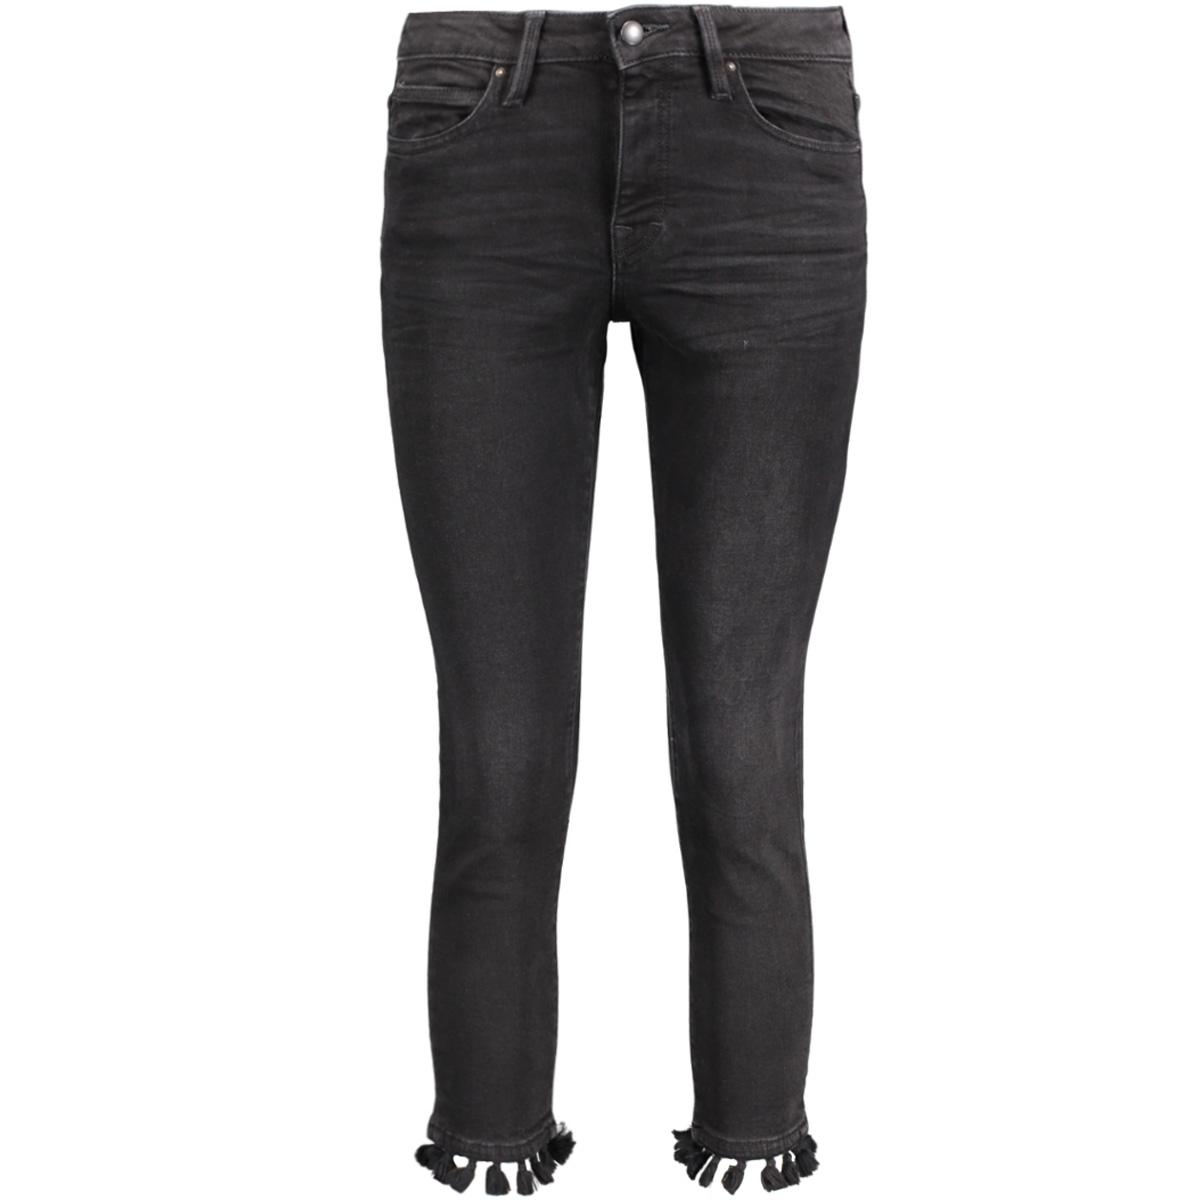 107cc1b035 edc jeans c911